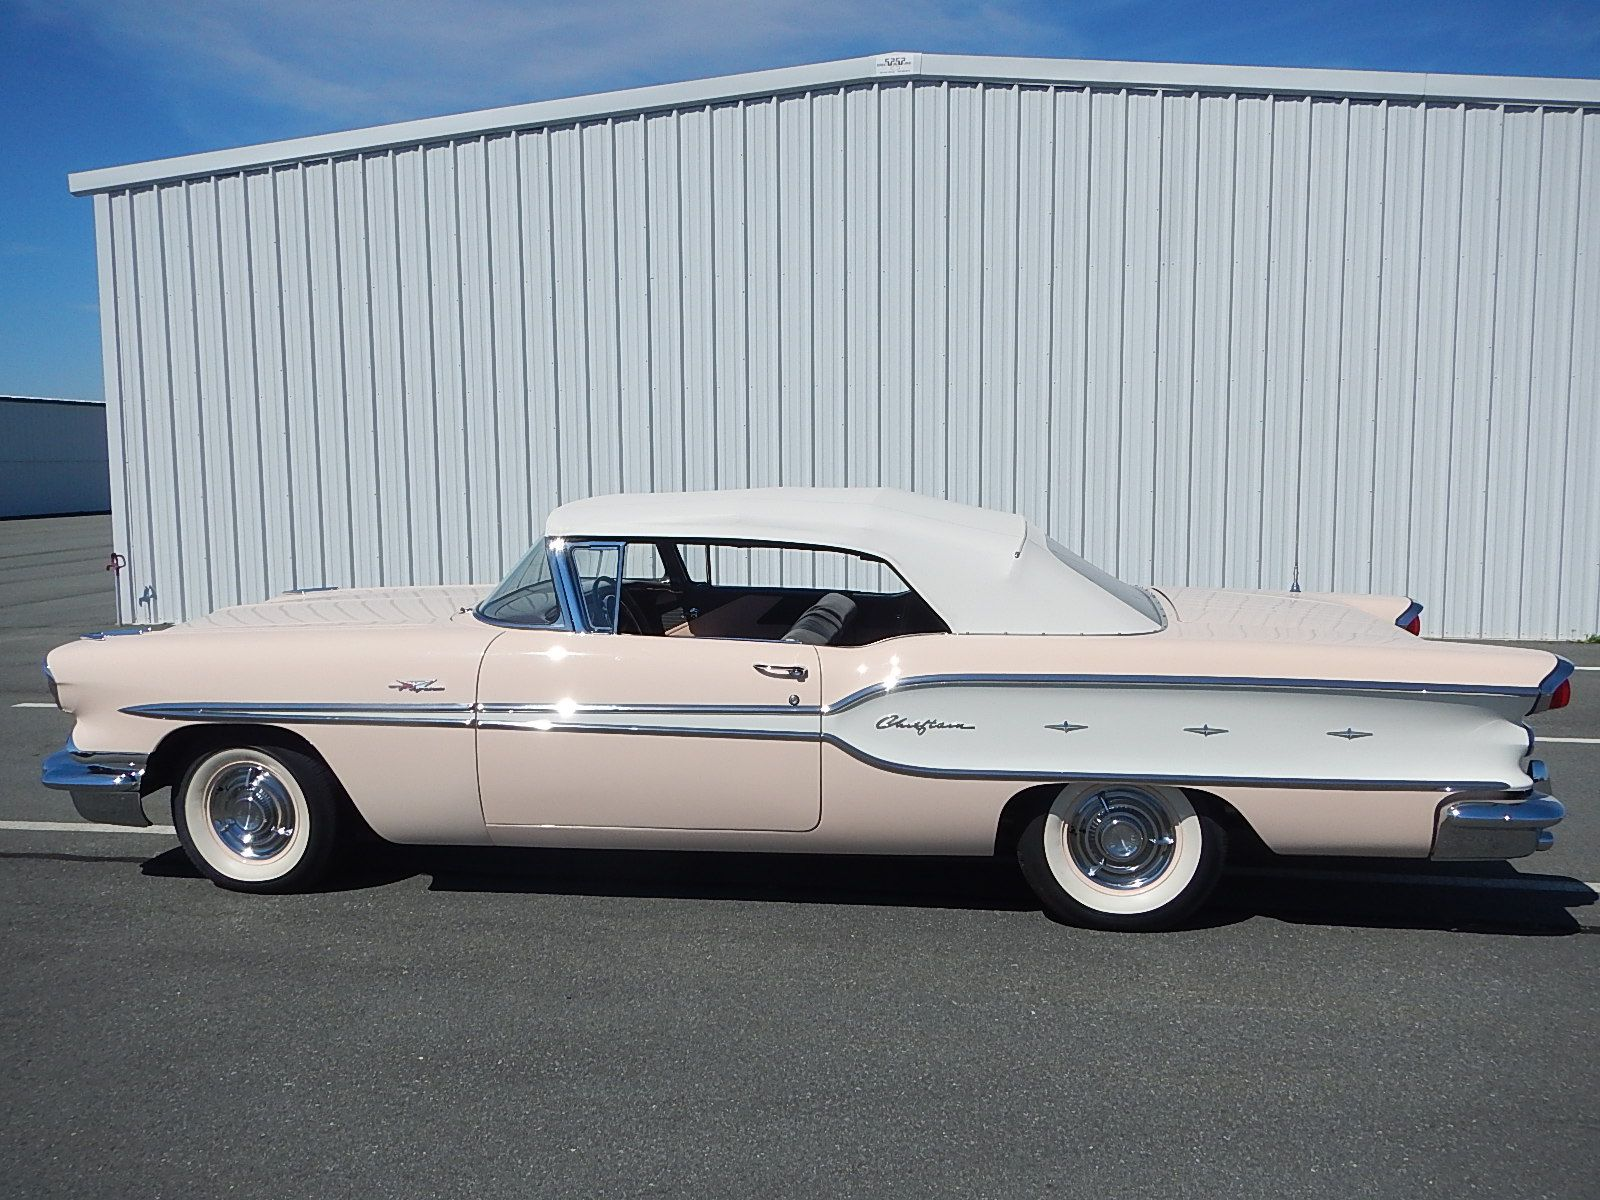 1958 Pontiac Chieftain Convertible - Tri Power aaca - 172.jpg